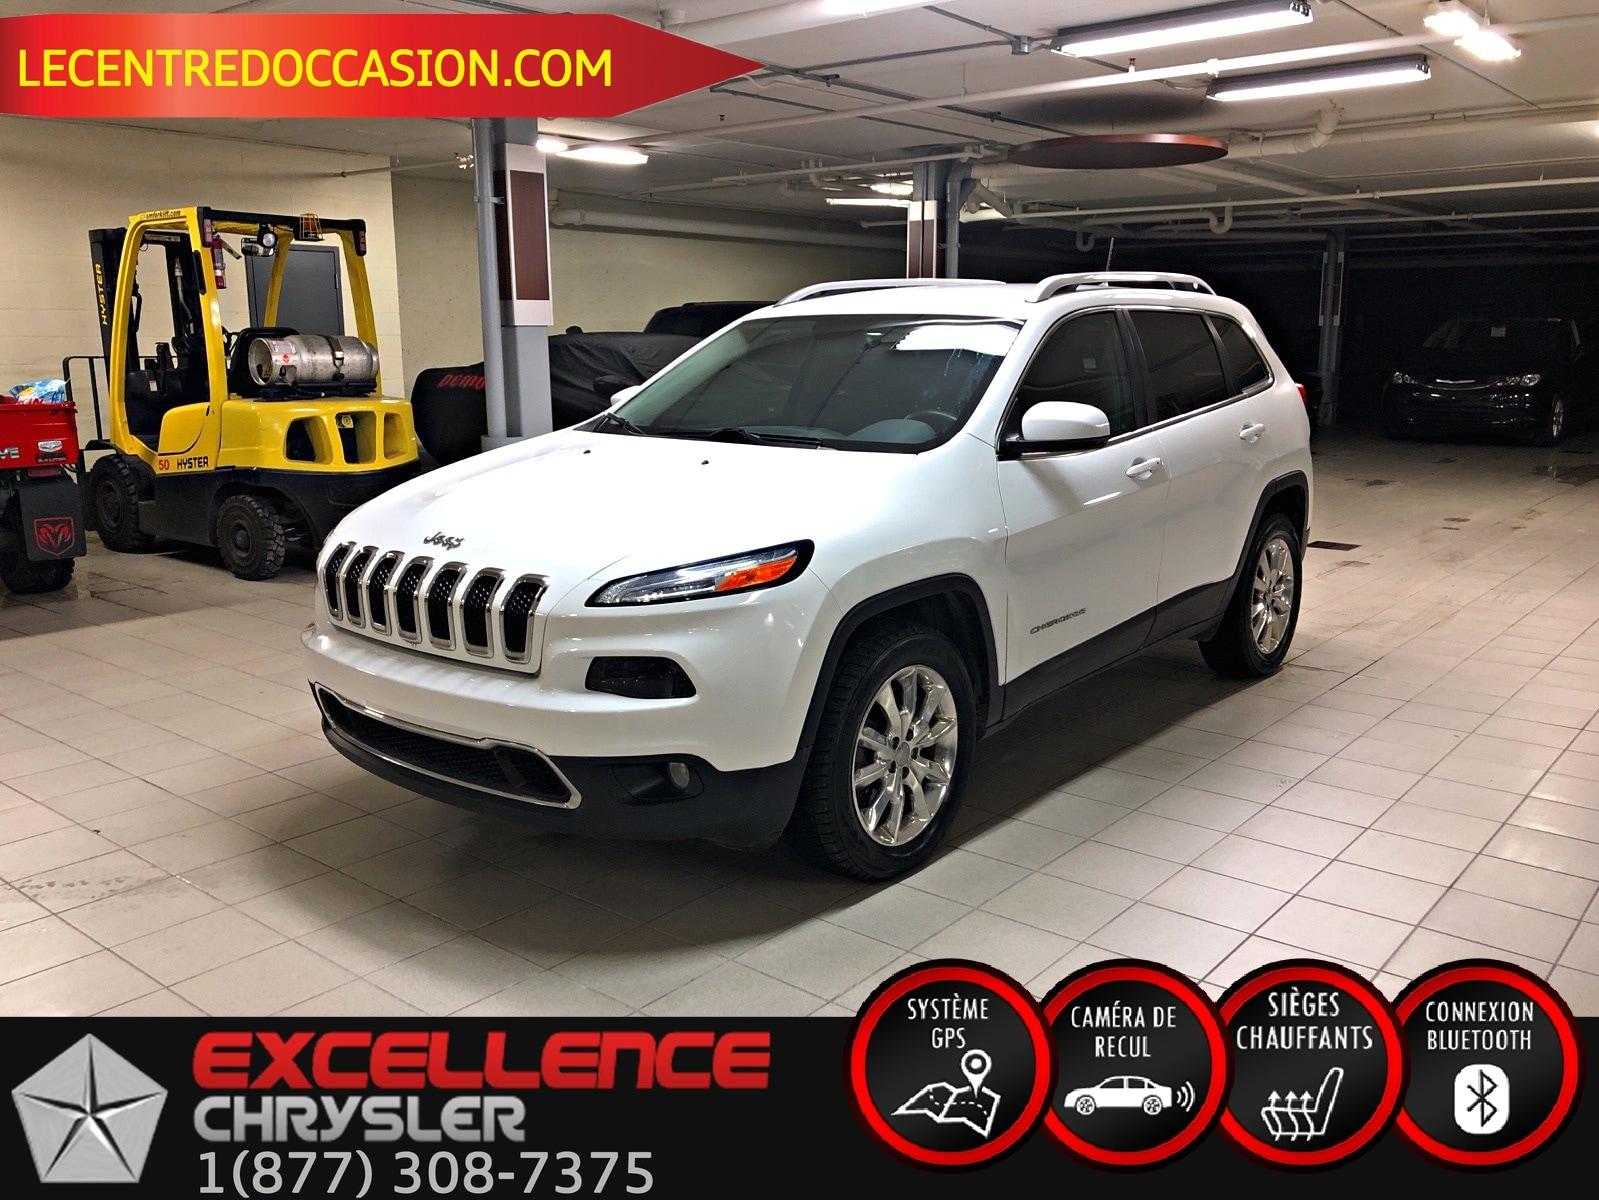 2016 Jeep Cherokee Limited 4X4 *CUIR/NAV/CAMERA/HITCH* VUS